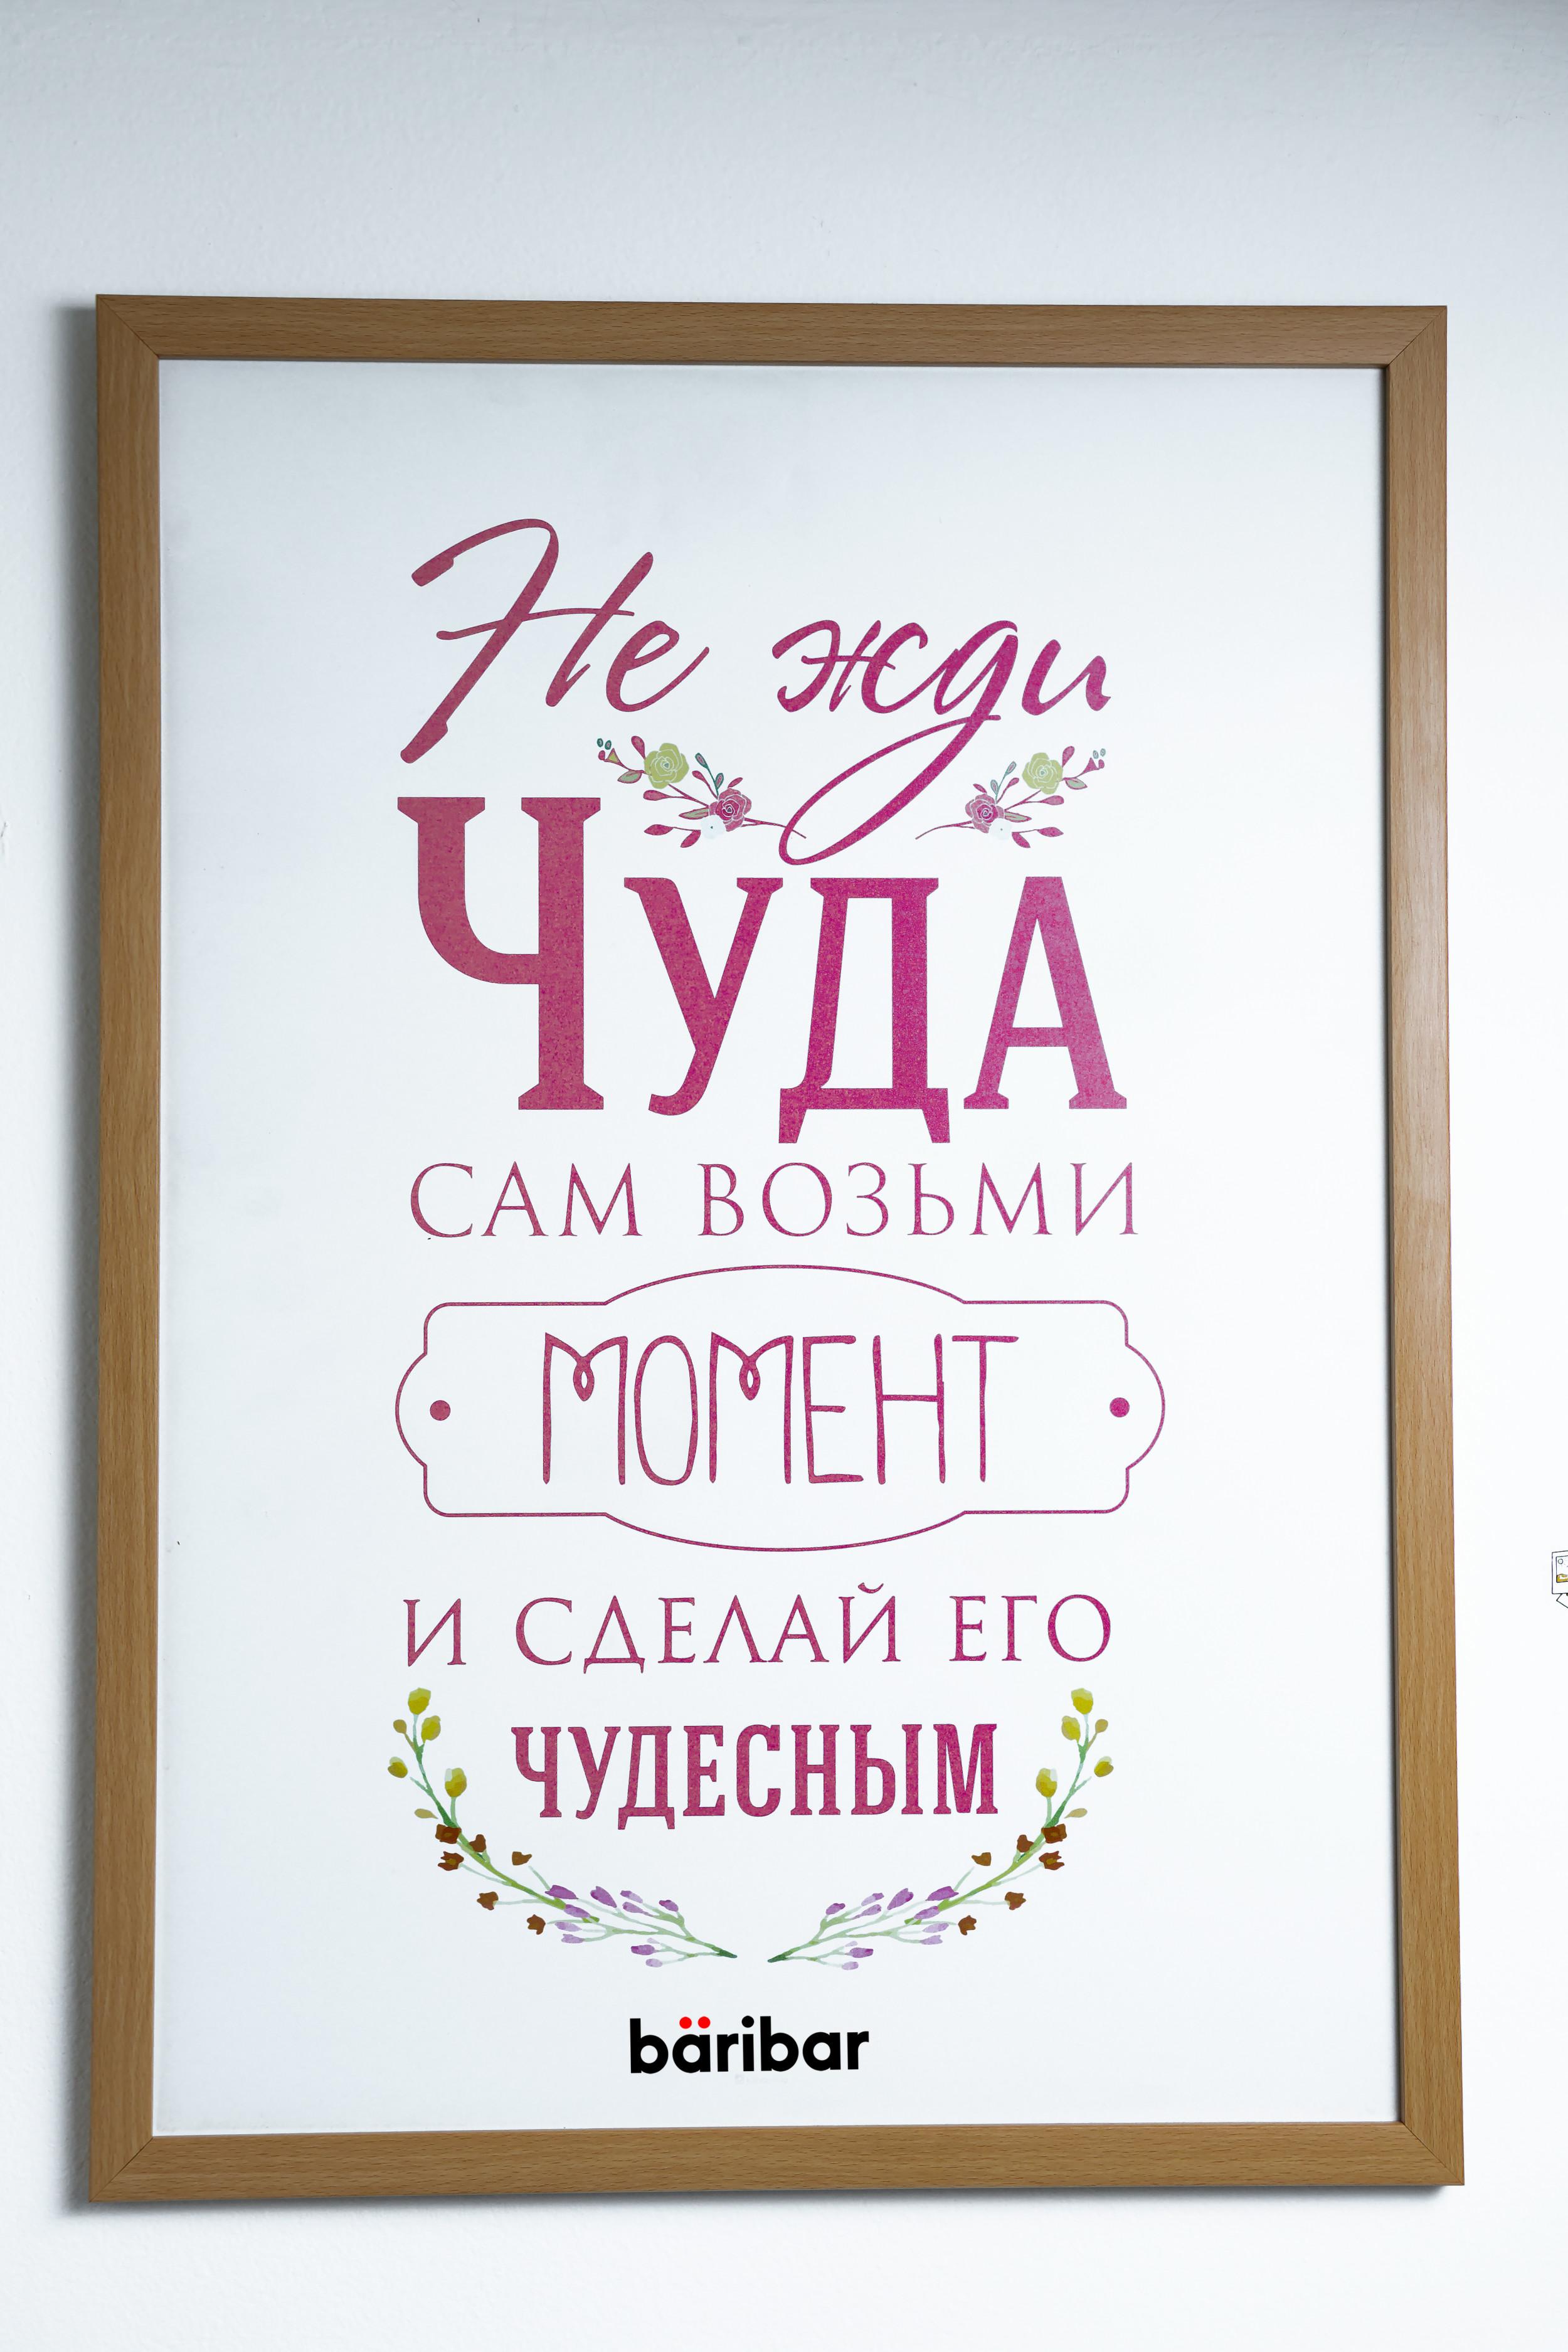 Анара Мирзахметова, татуировщик